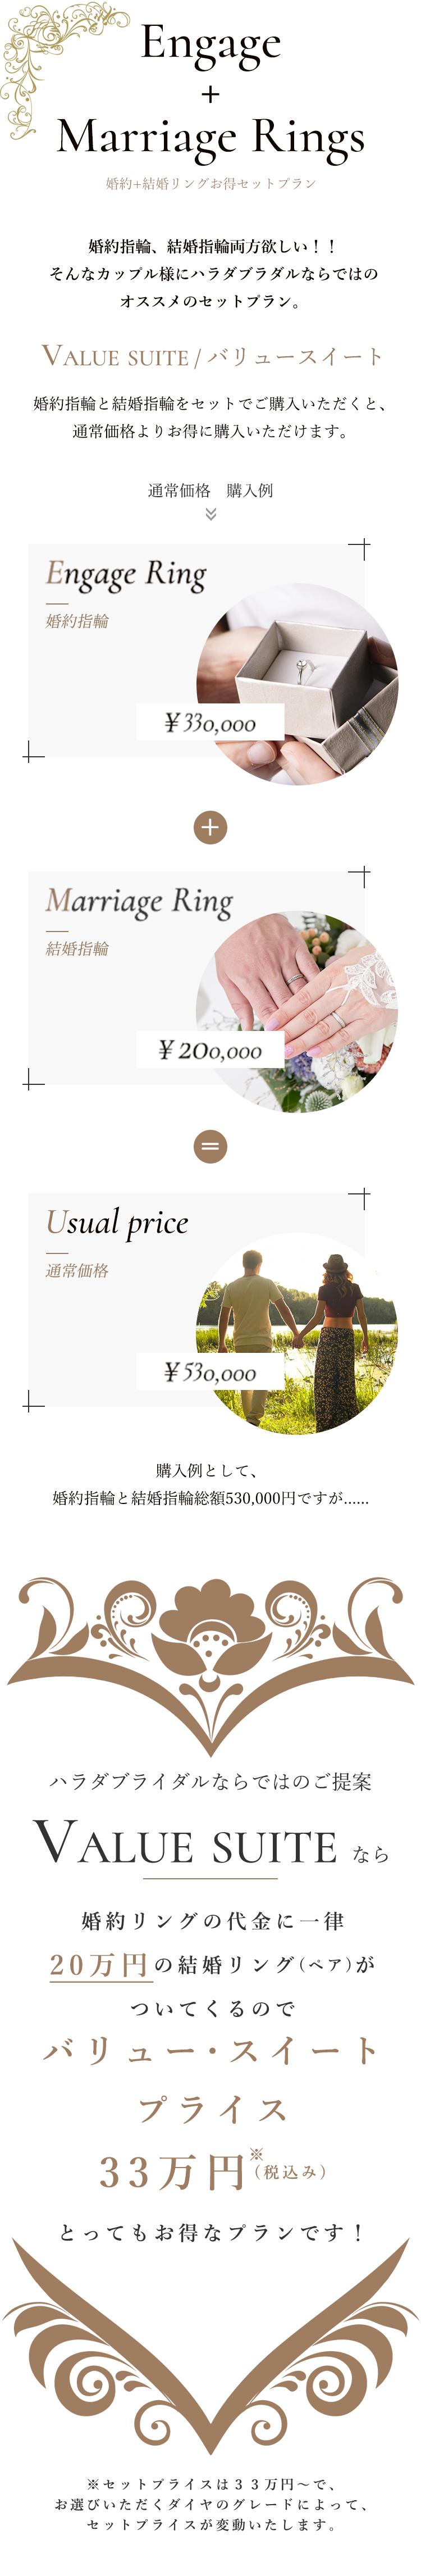 value suite img